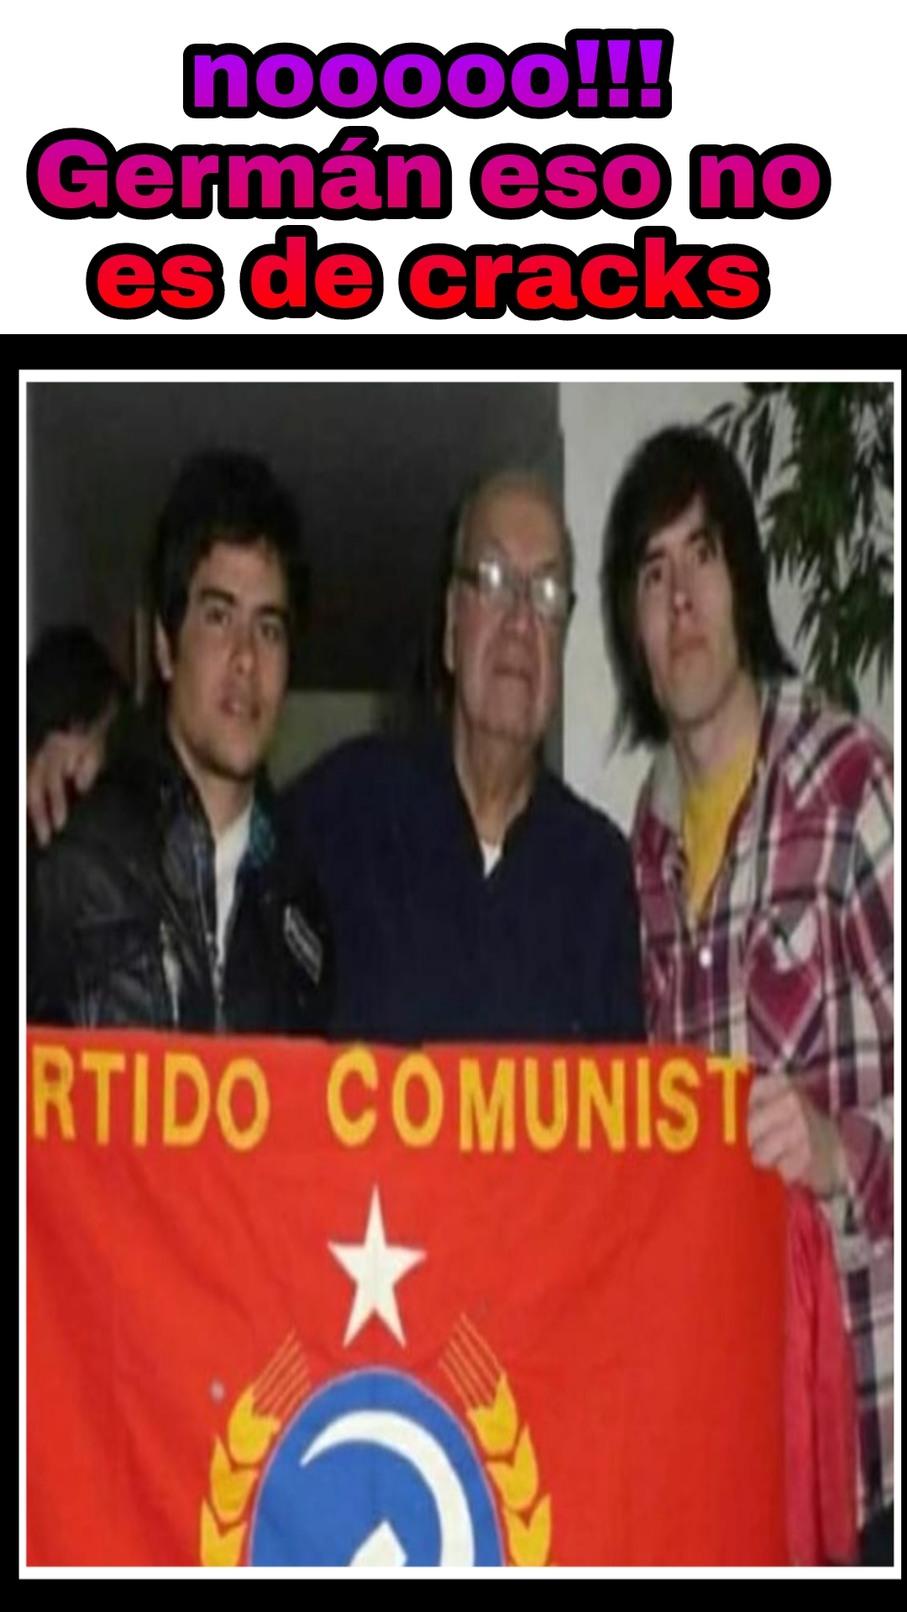 Germán comunista - meme